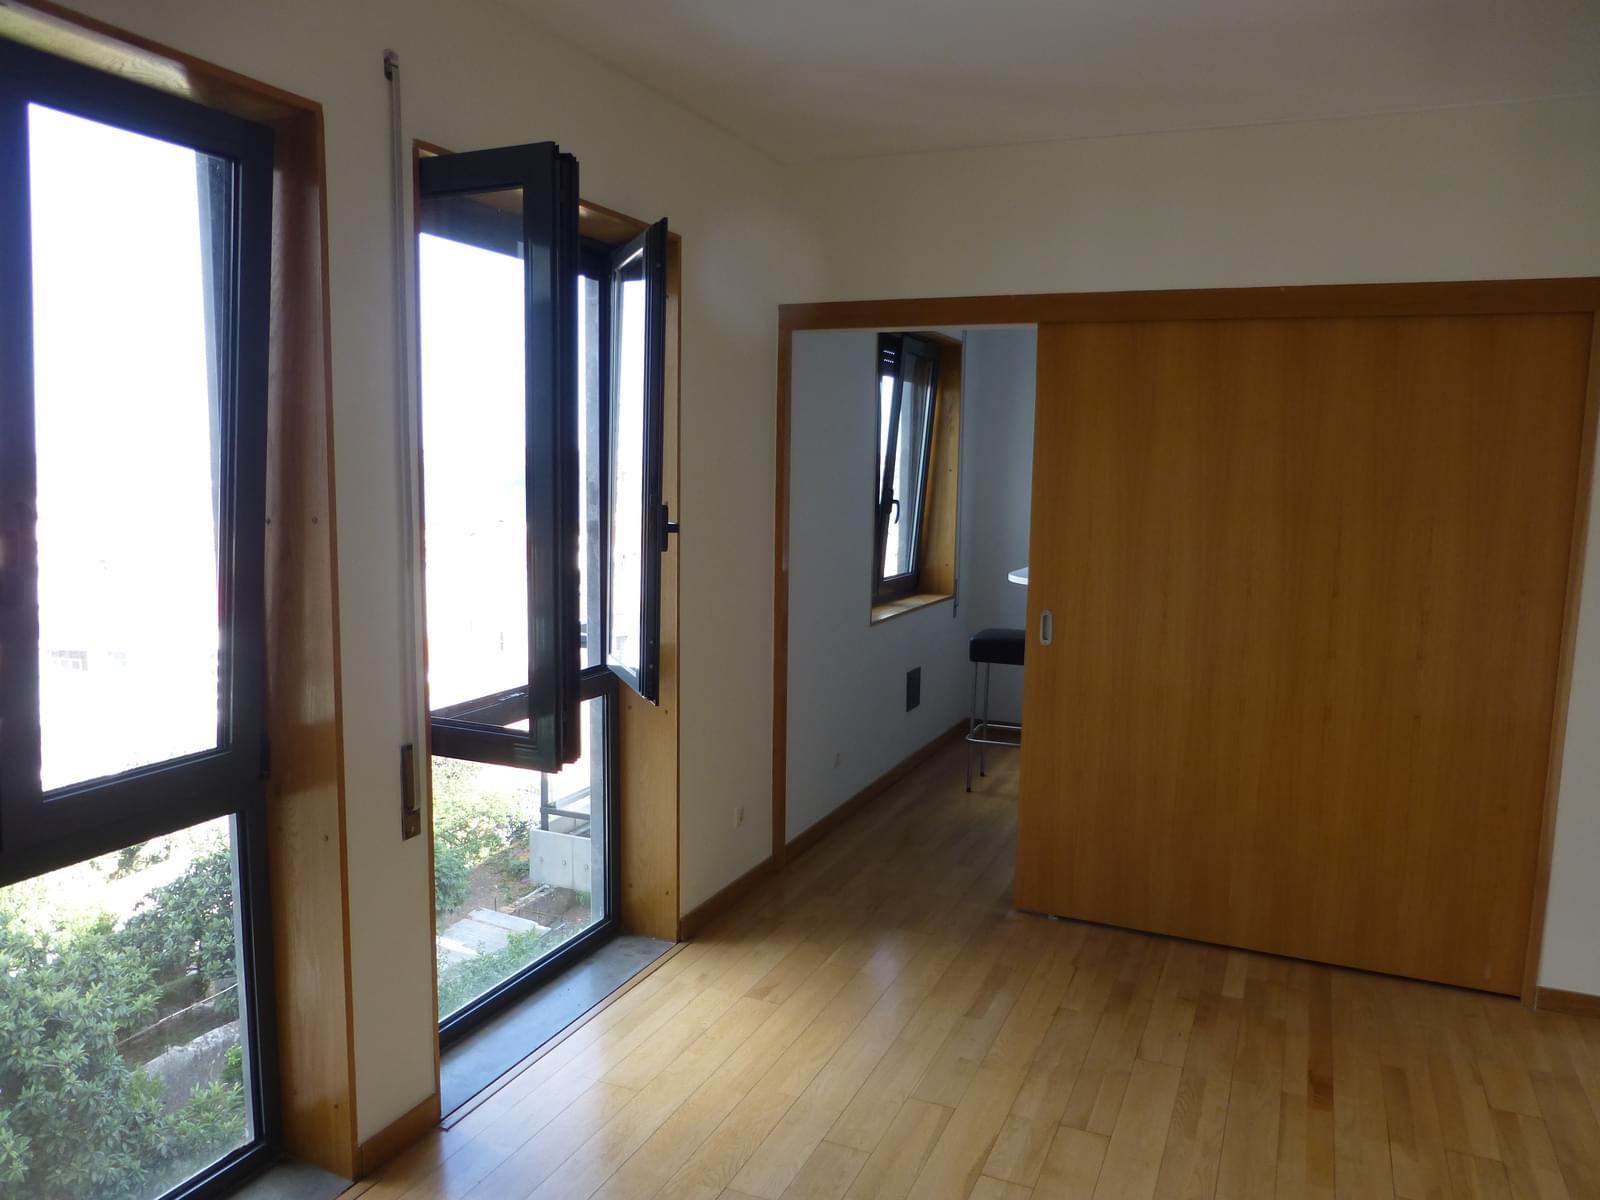 pf17050-apartamento-t1-lisboa-bef822a1-f4cb-45c1-8e5f-1eb915f1690d